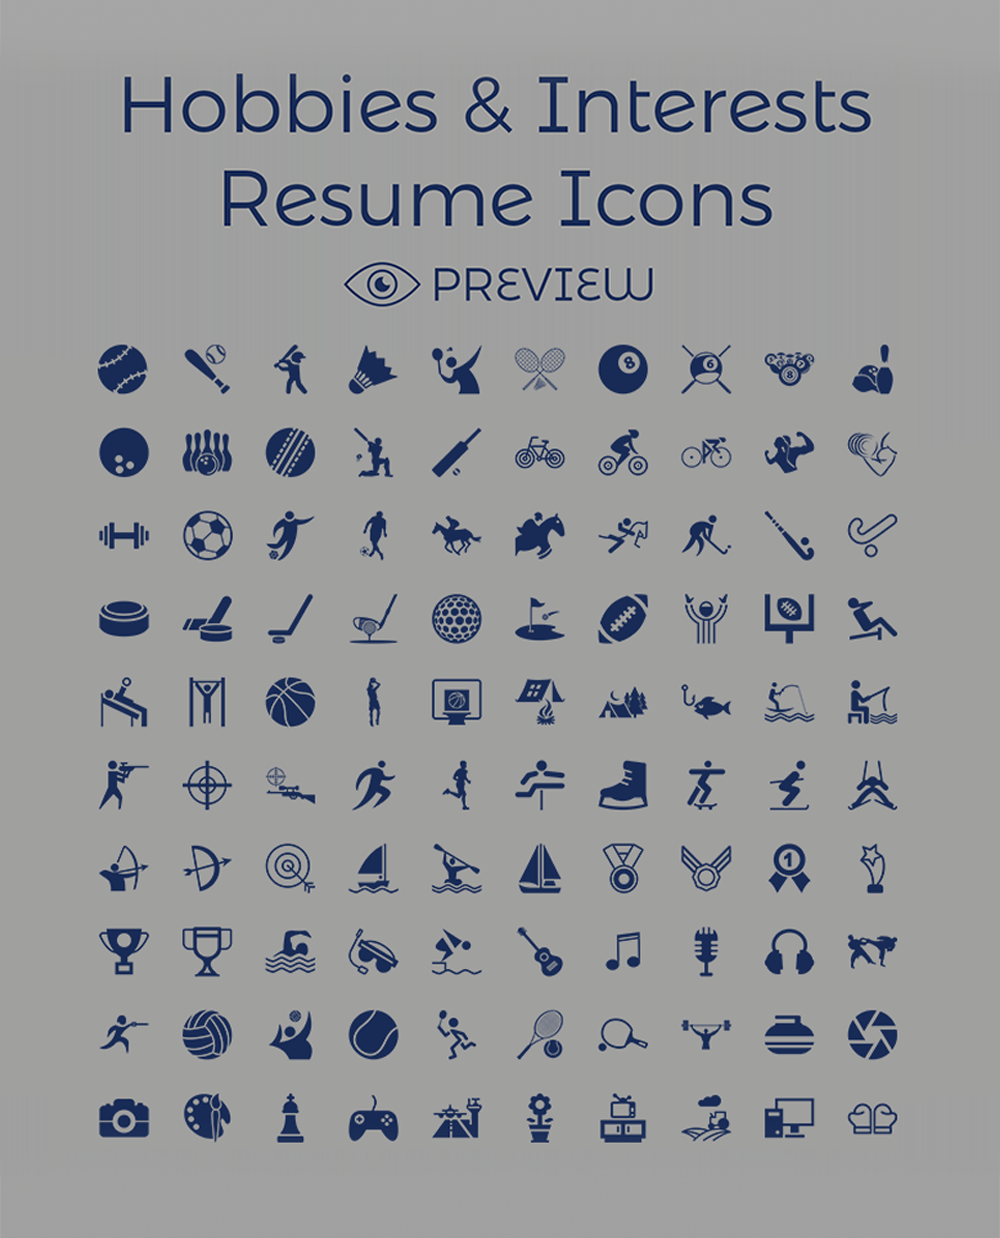 Creative Resume CV Design Cover Letter Template 4 PSD Mock Ups Amp 100 Resume Icons Good Resume